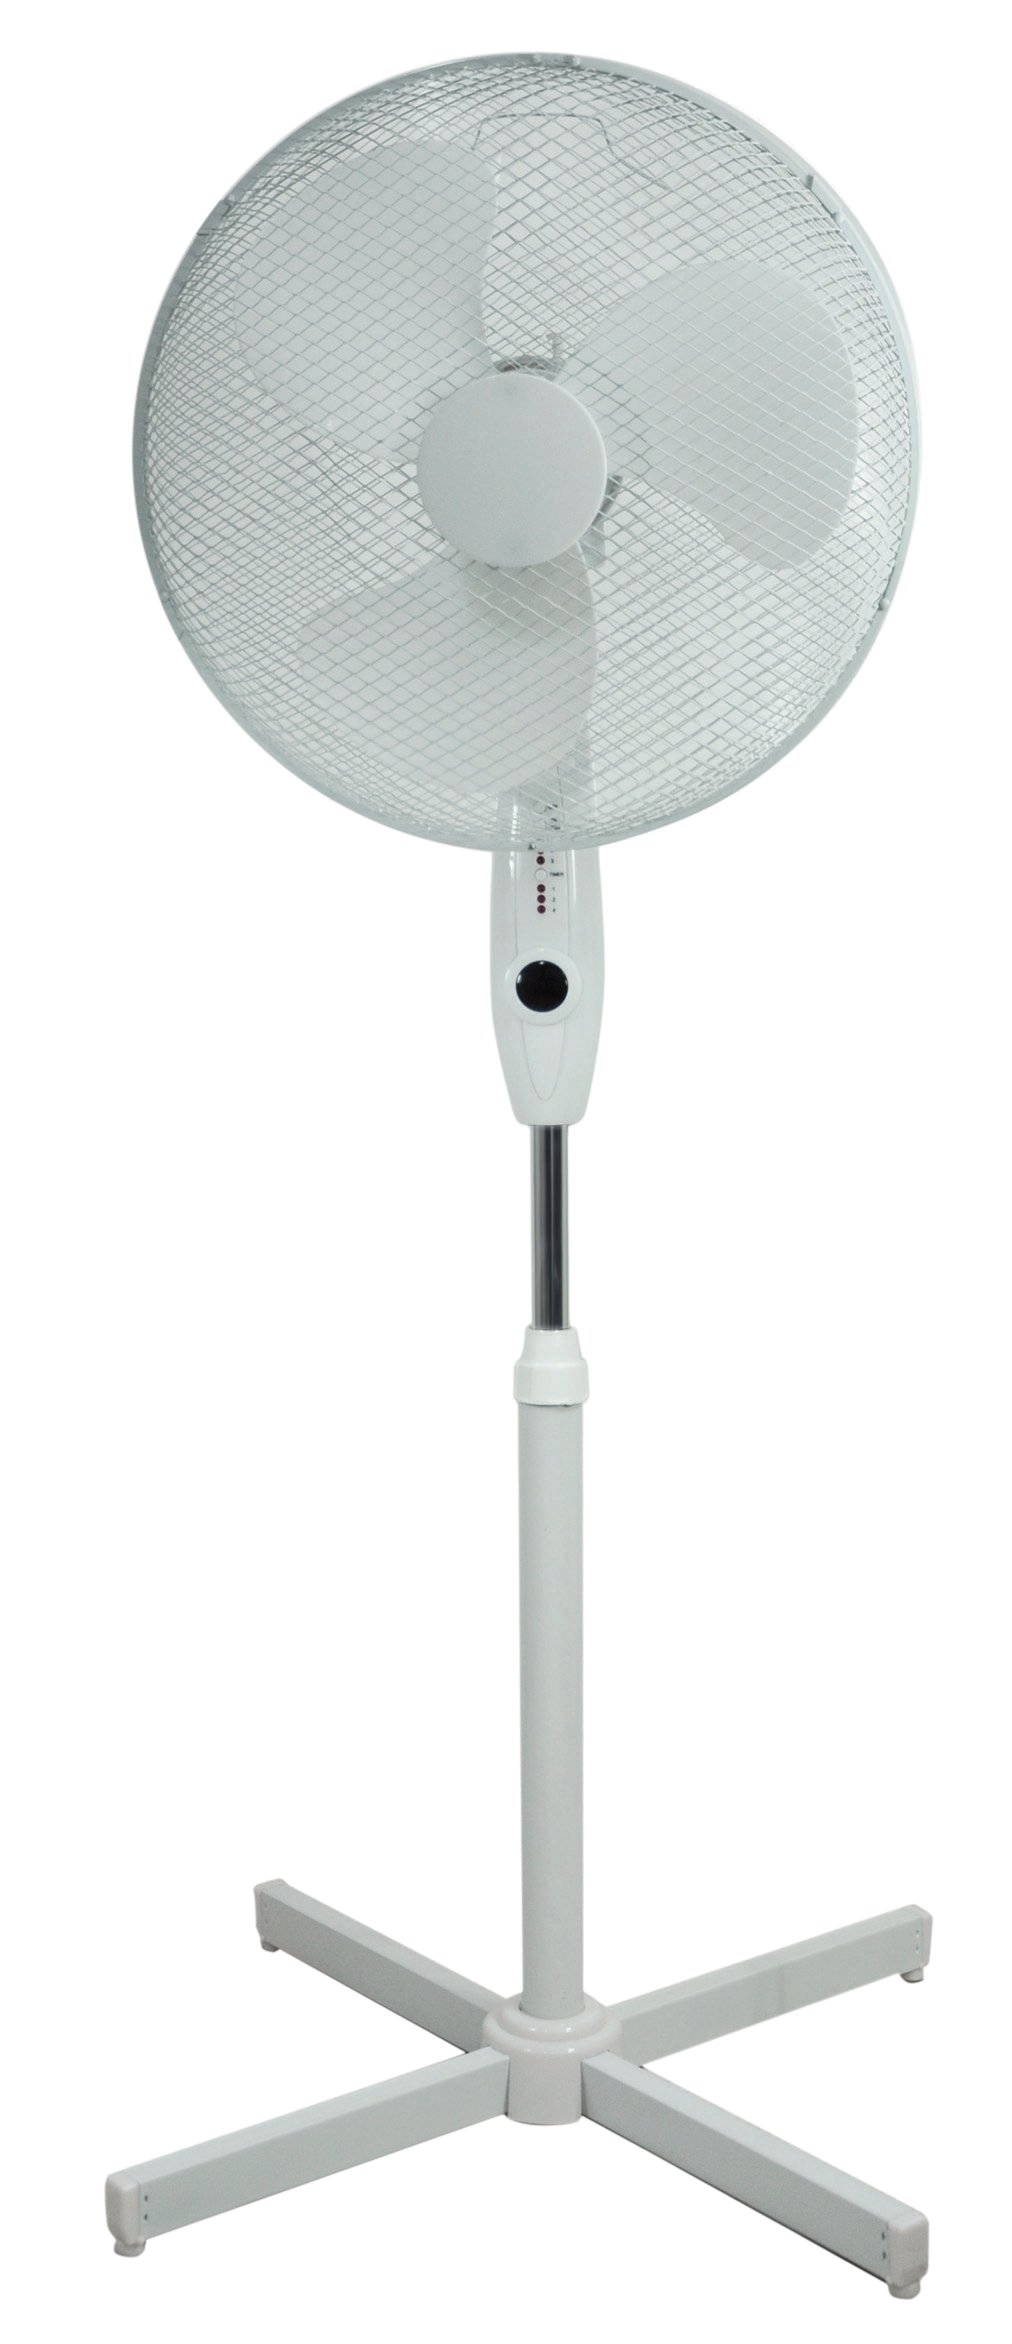 Prem-i-air 16″ Pedestal Fan Oscillating 3 Speeds + Remote Control (Black)